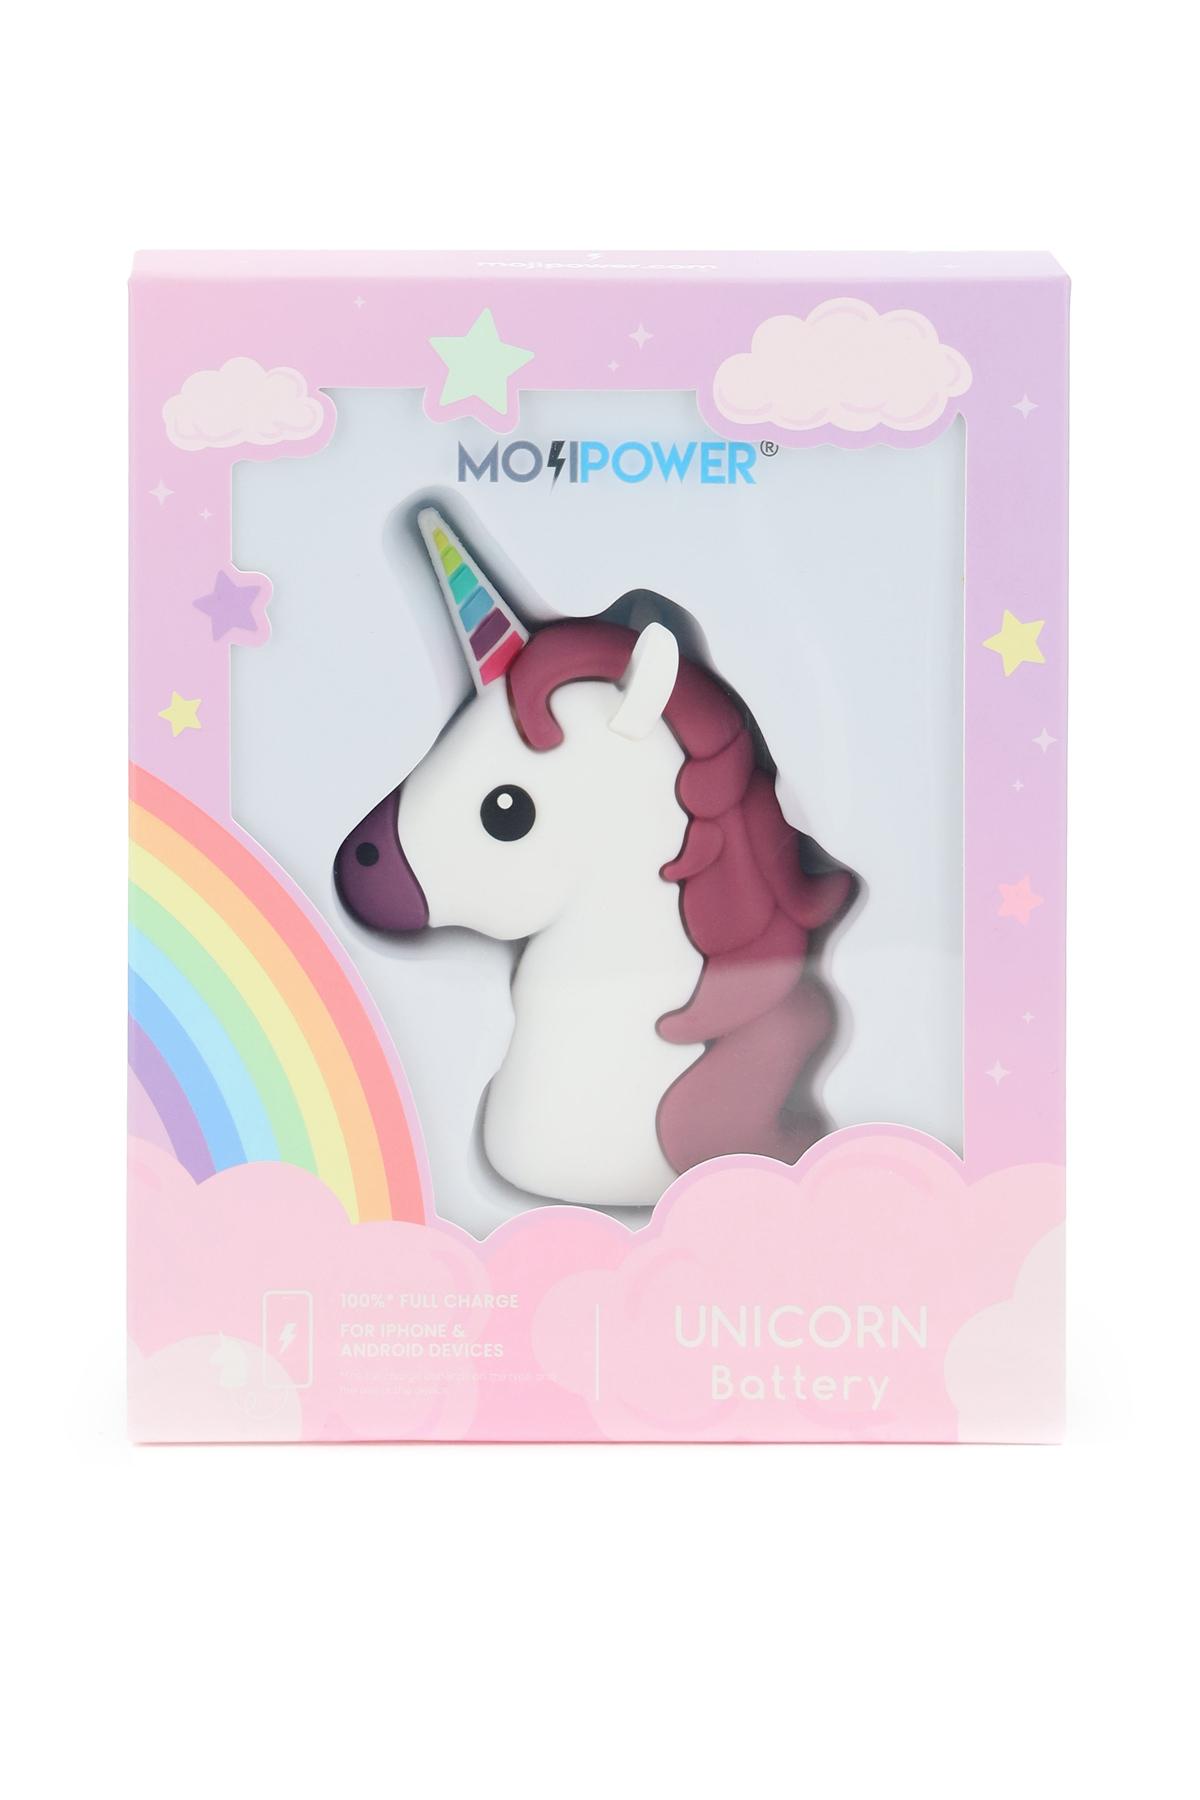 L10 power bank mojipower unicorn